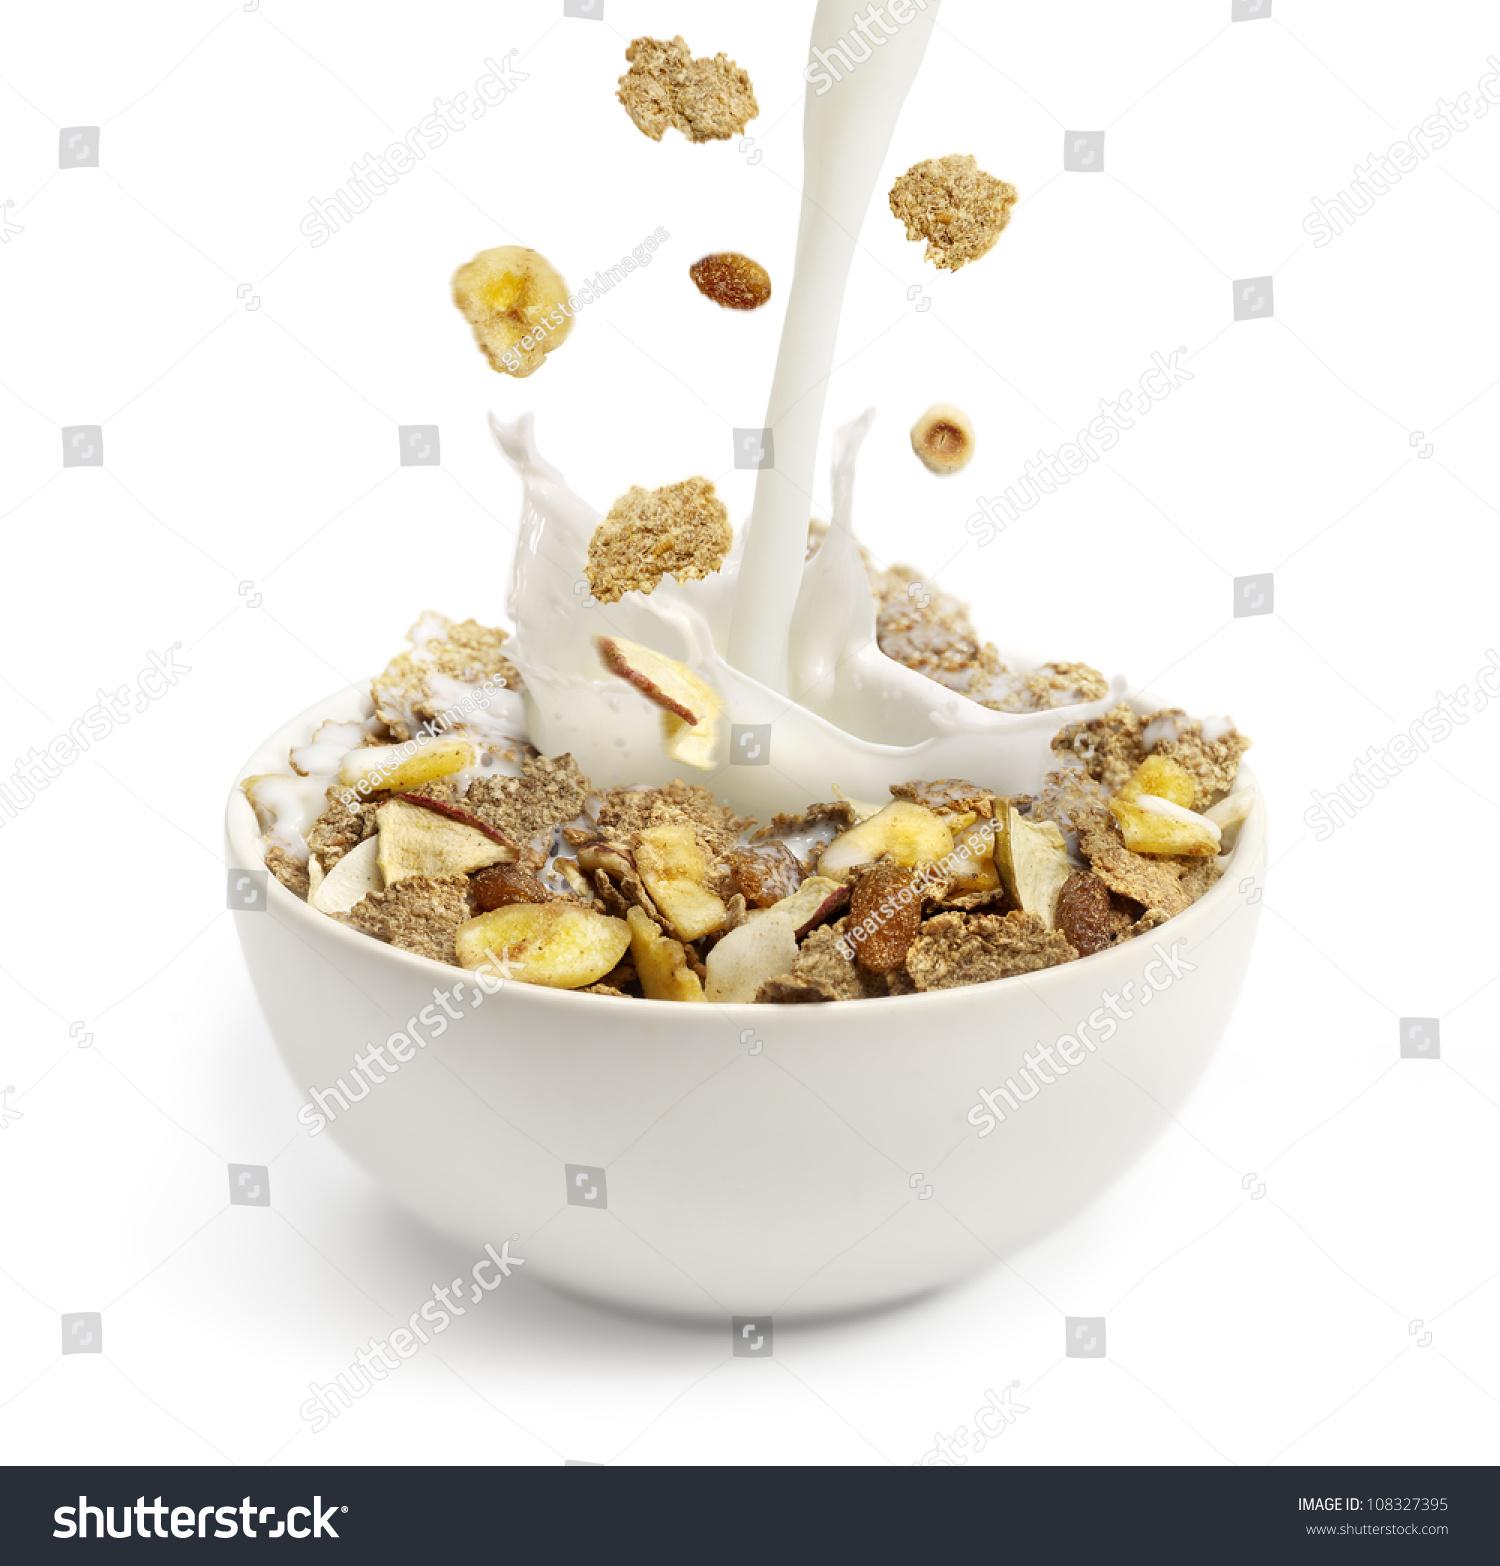 Cereal Milk Pouring Into White Bowl Stock Photo 108327395